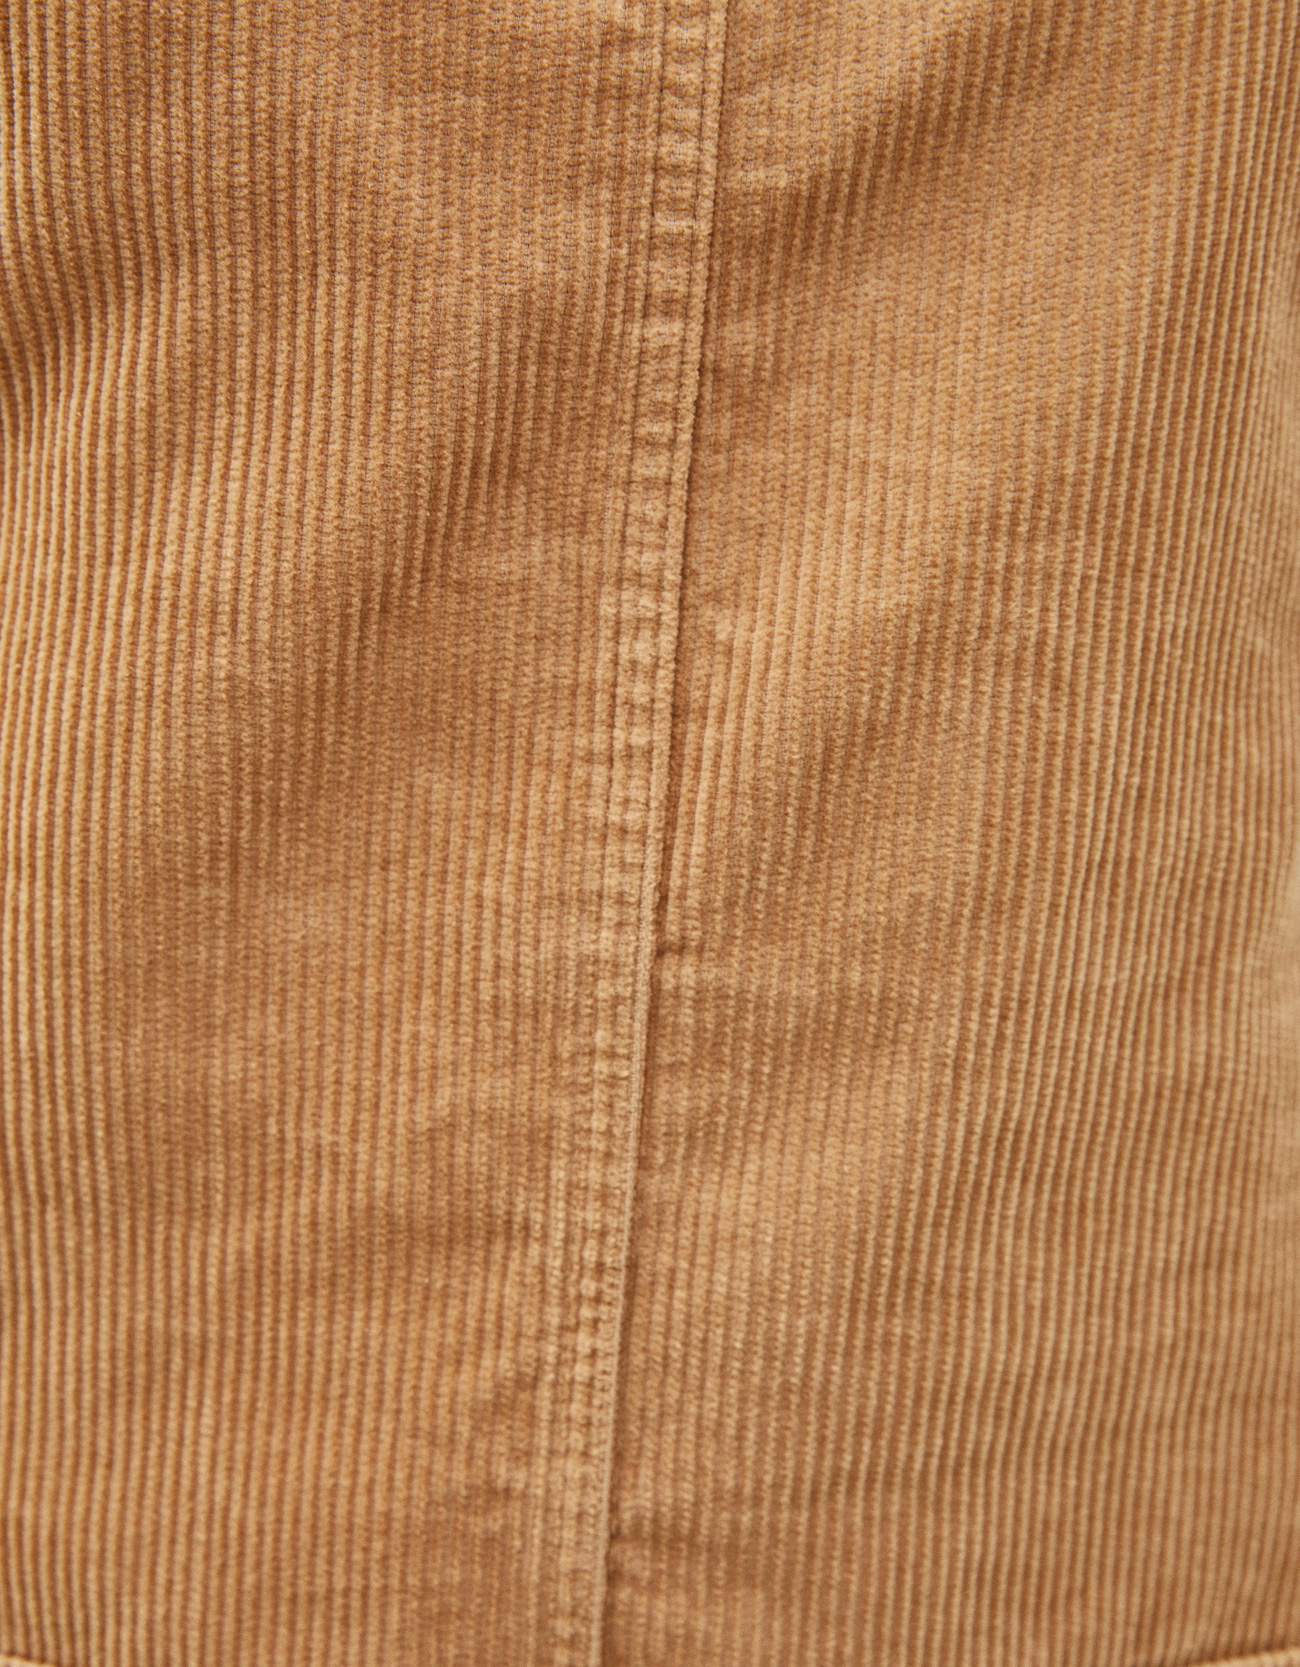 ce7b5f2c45 Corduroy pinafore dress - Dresses - Bershka Malta